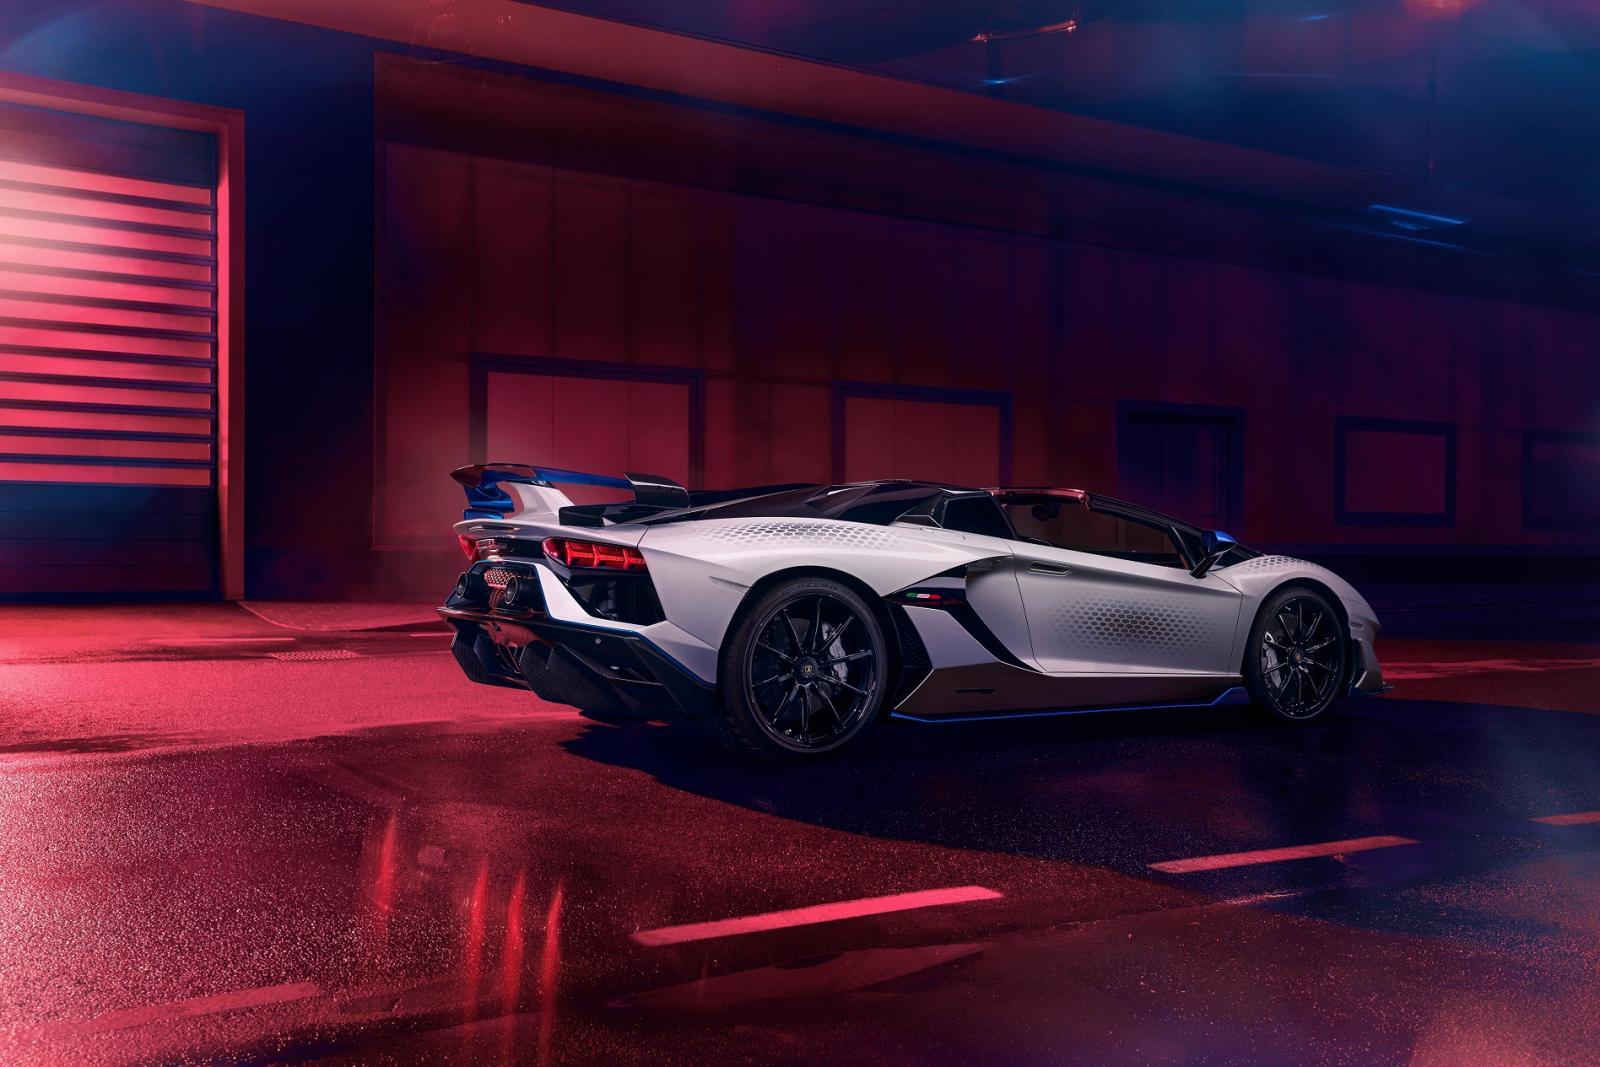 Lamborghini Aventador SVJ Xego Edition